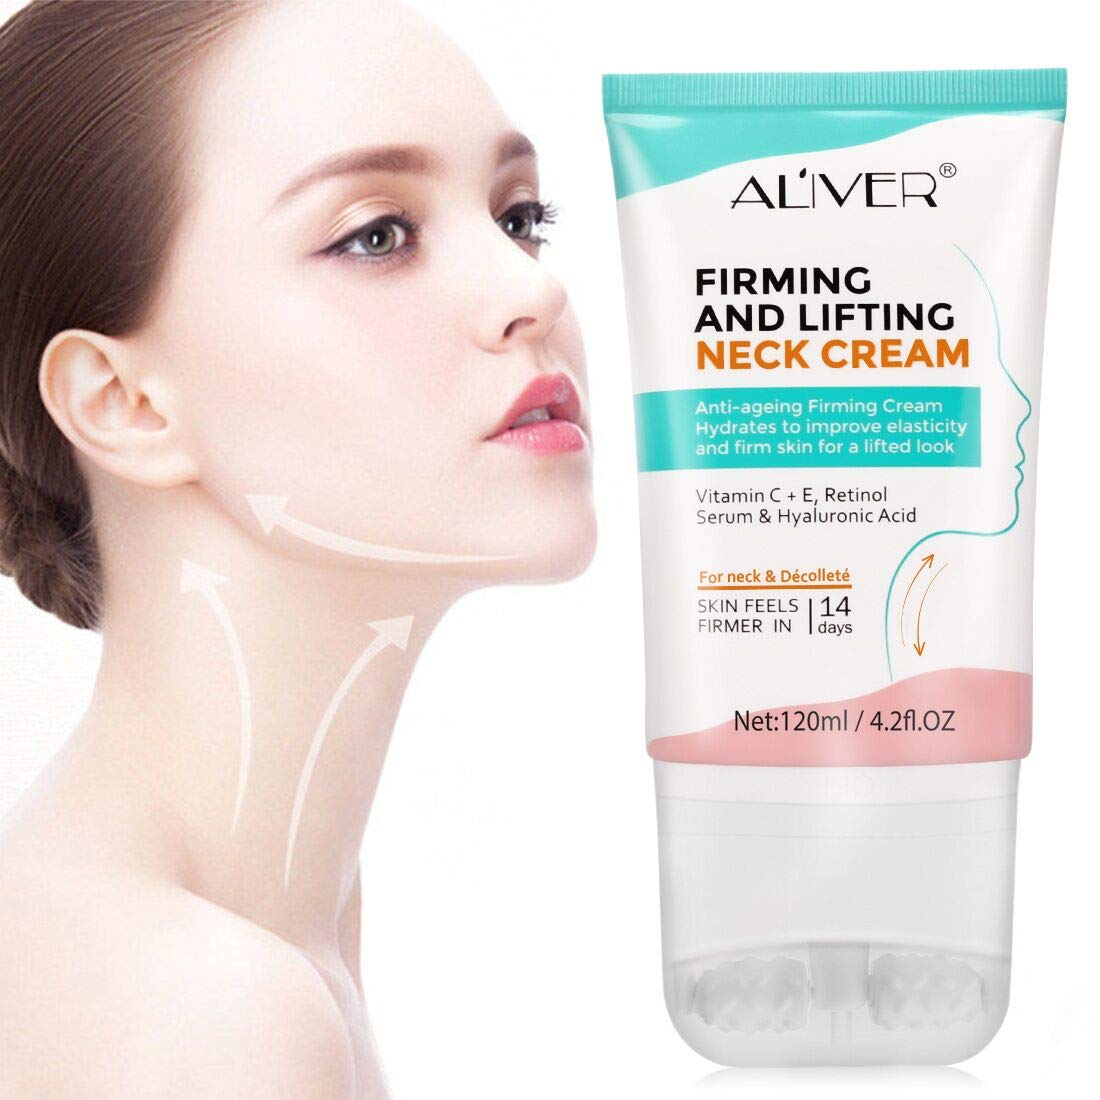 Aliver Neck Cream with Vitamin C E,Retinol Serum & Hyaluronic Acid